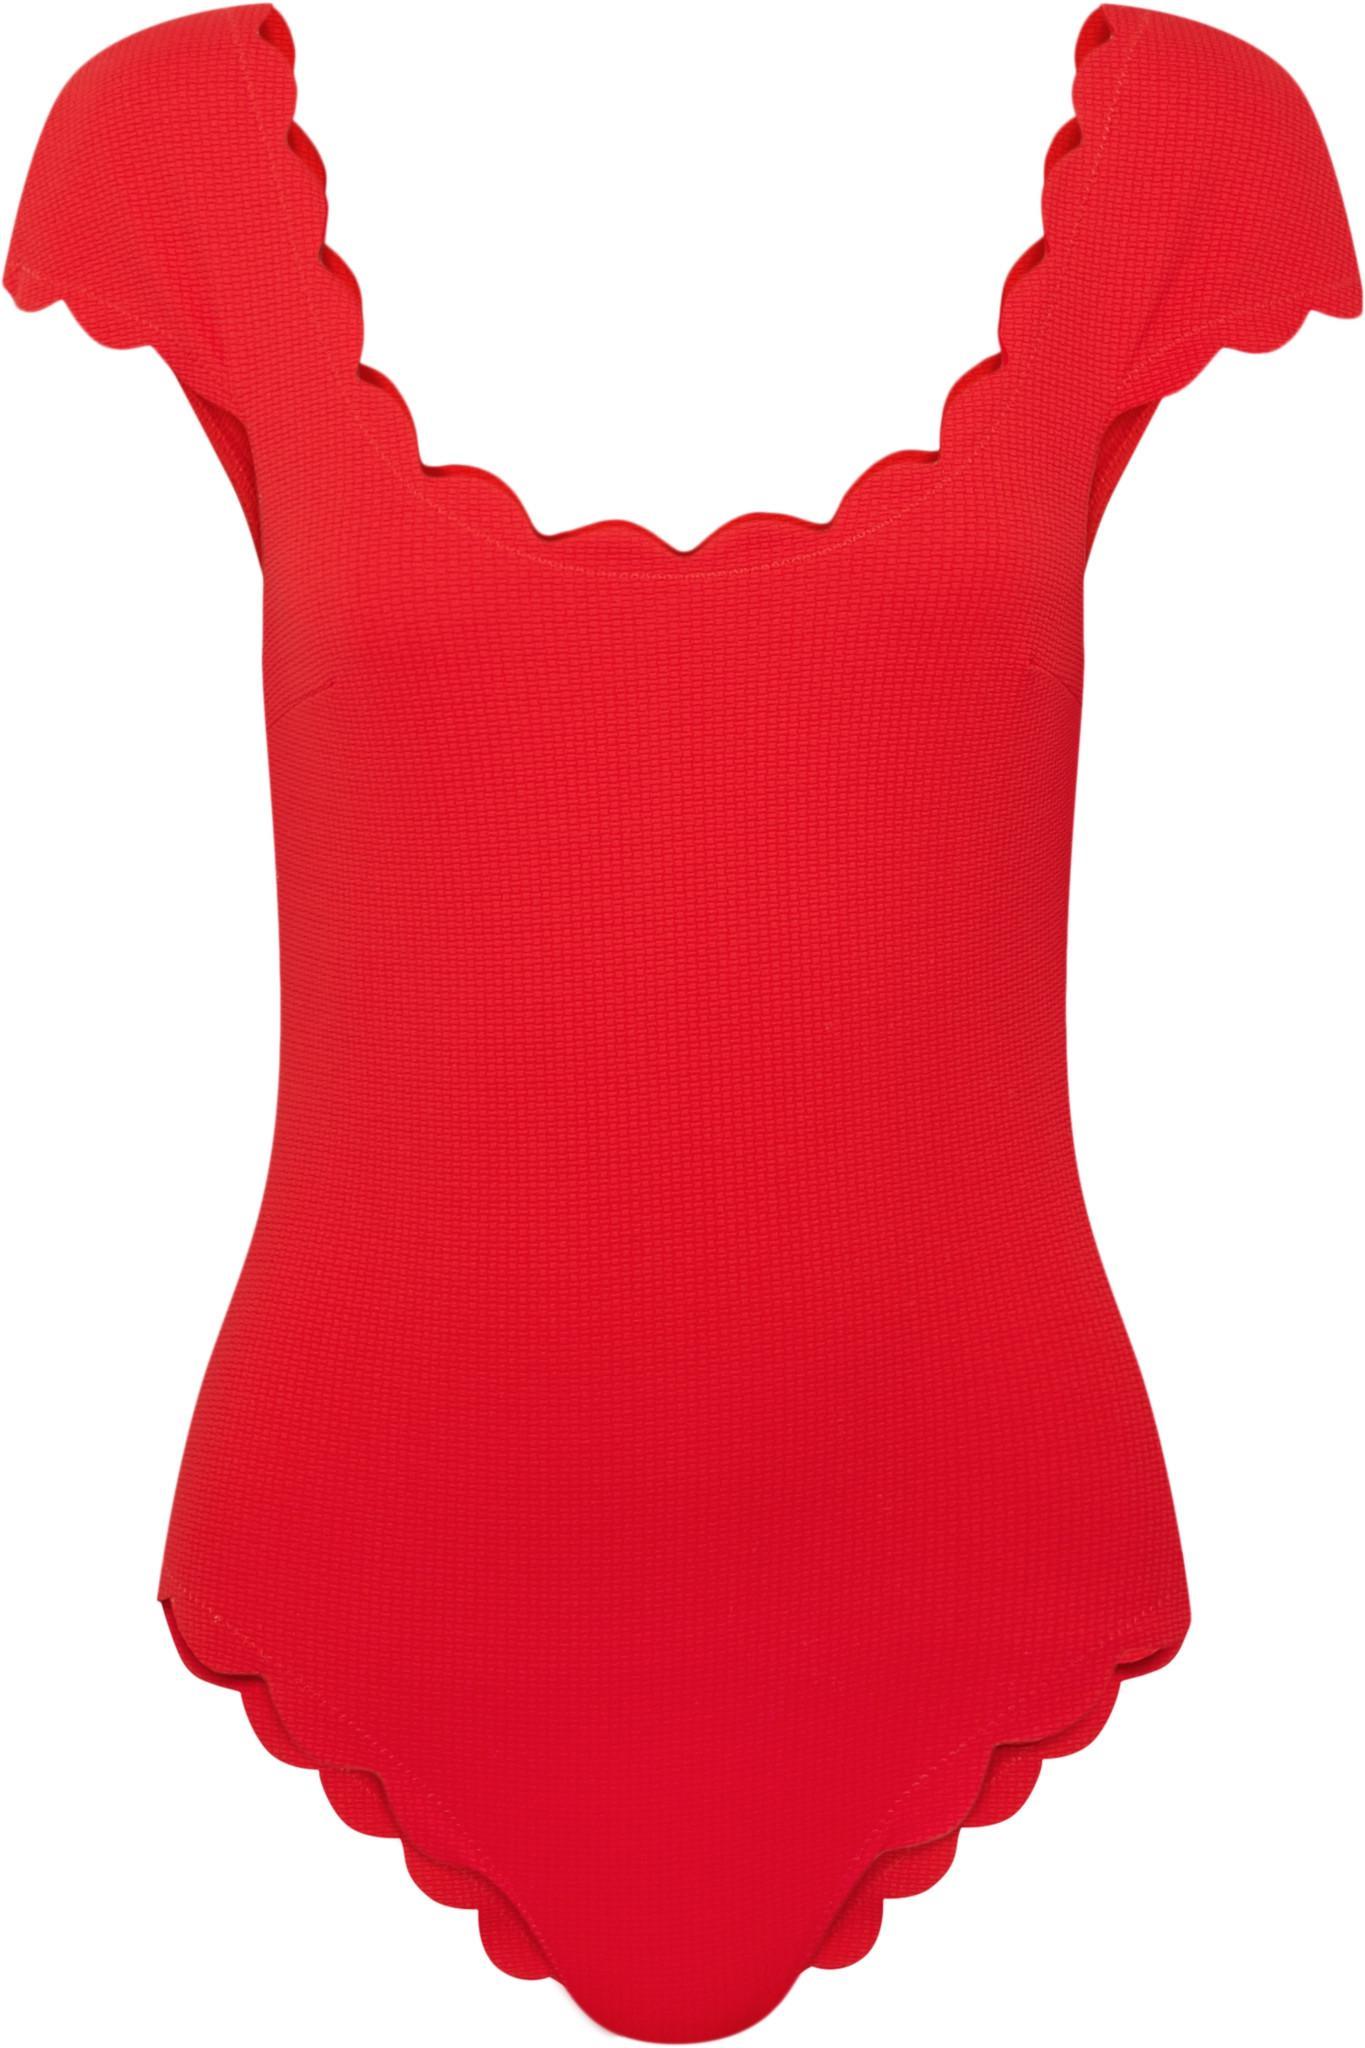 GANNI - Maillot De Bain Imprimé Profilic - Rouge Ebay En Ligne zWnqCRUEk